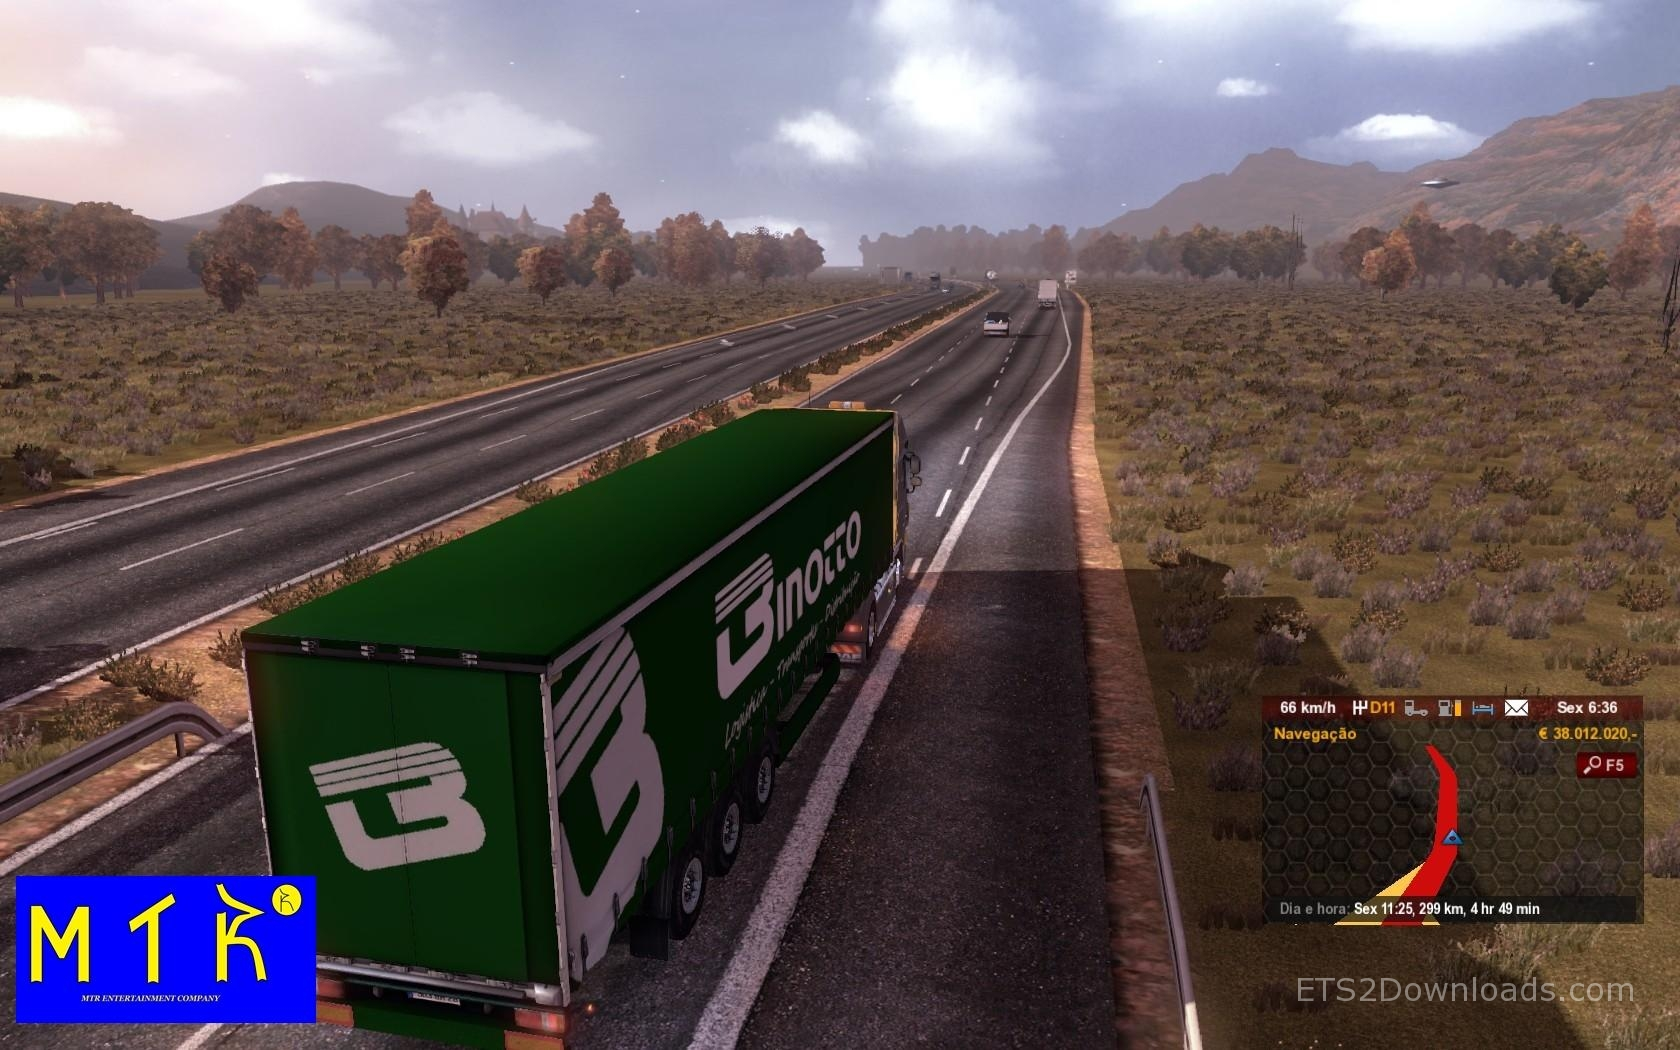 binotto-transportes-trailer-ets2-1